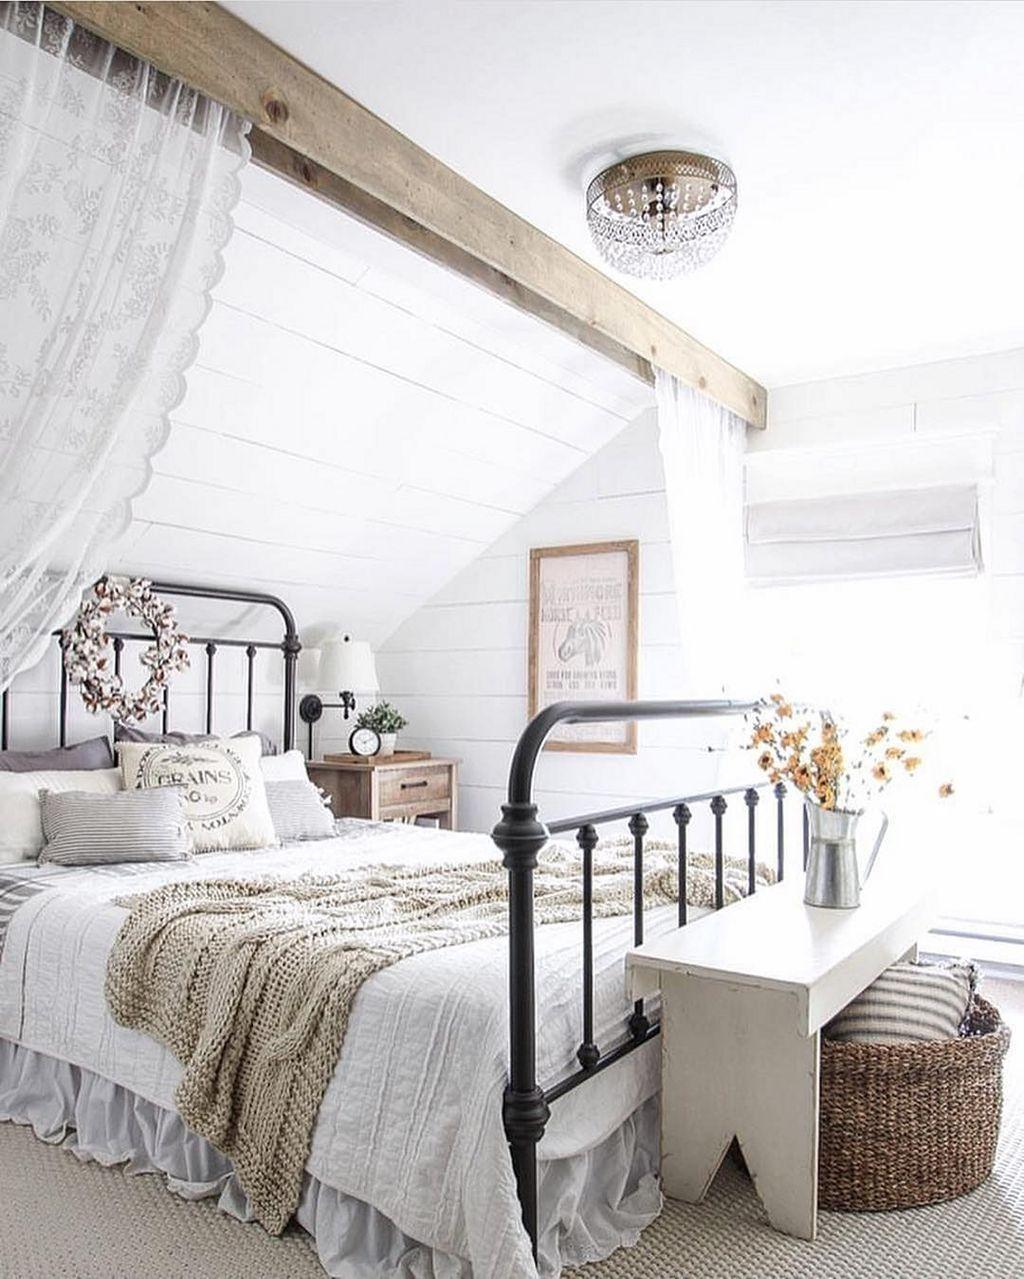 Style campagne chic décoration intérieure Avéo Styles & Travaux